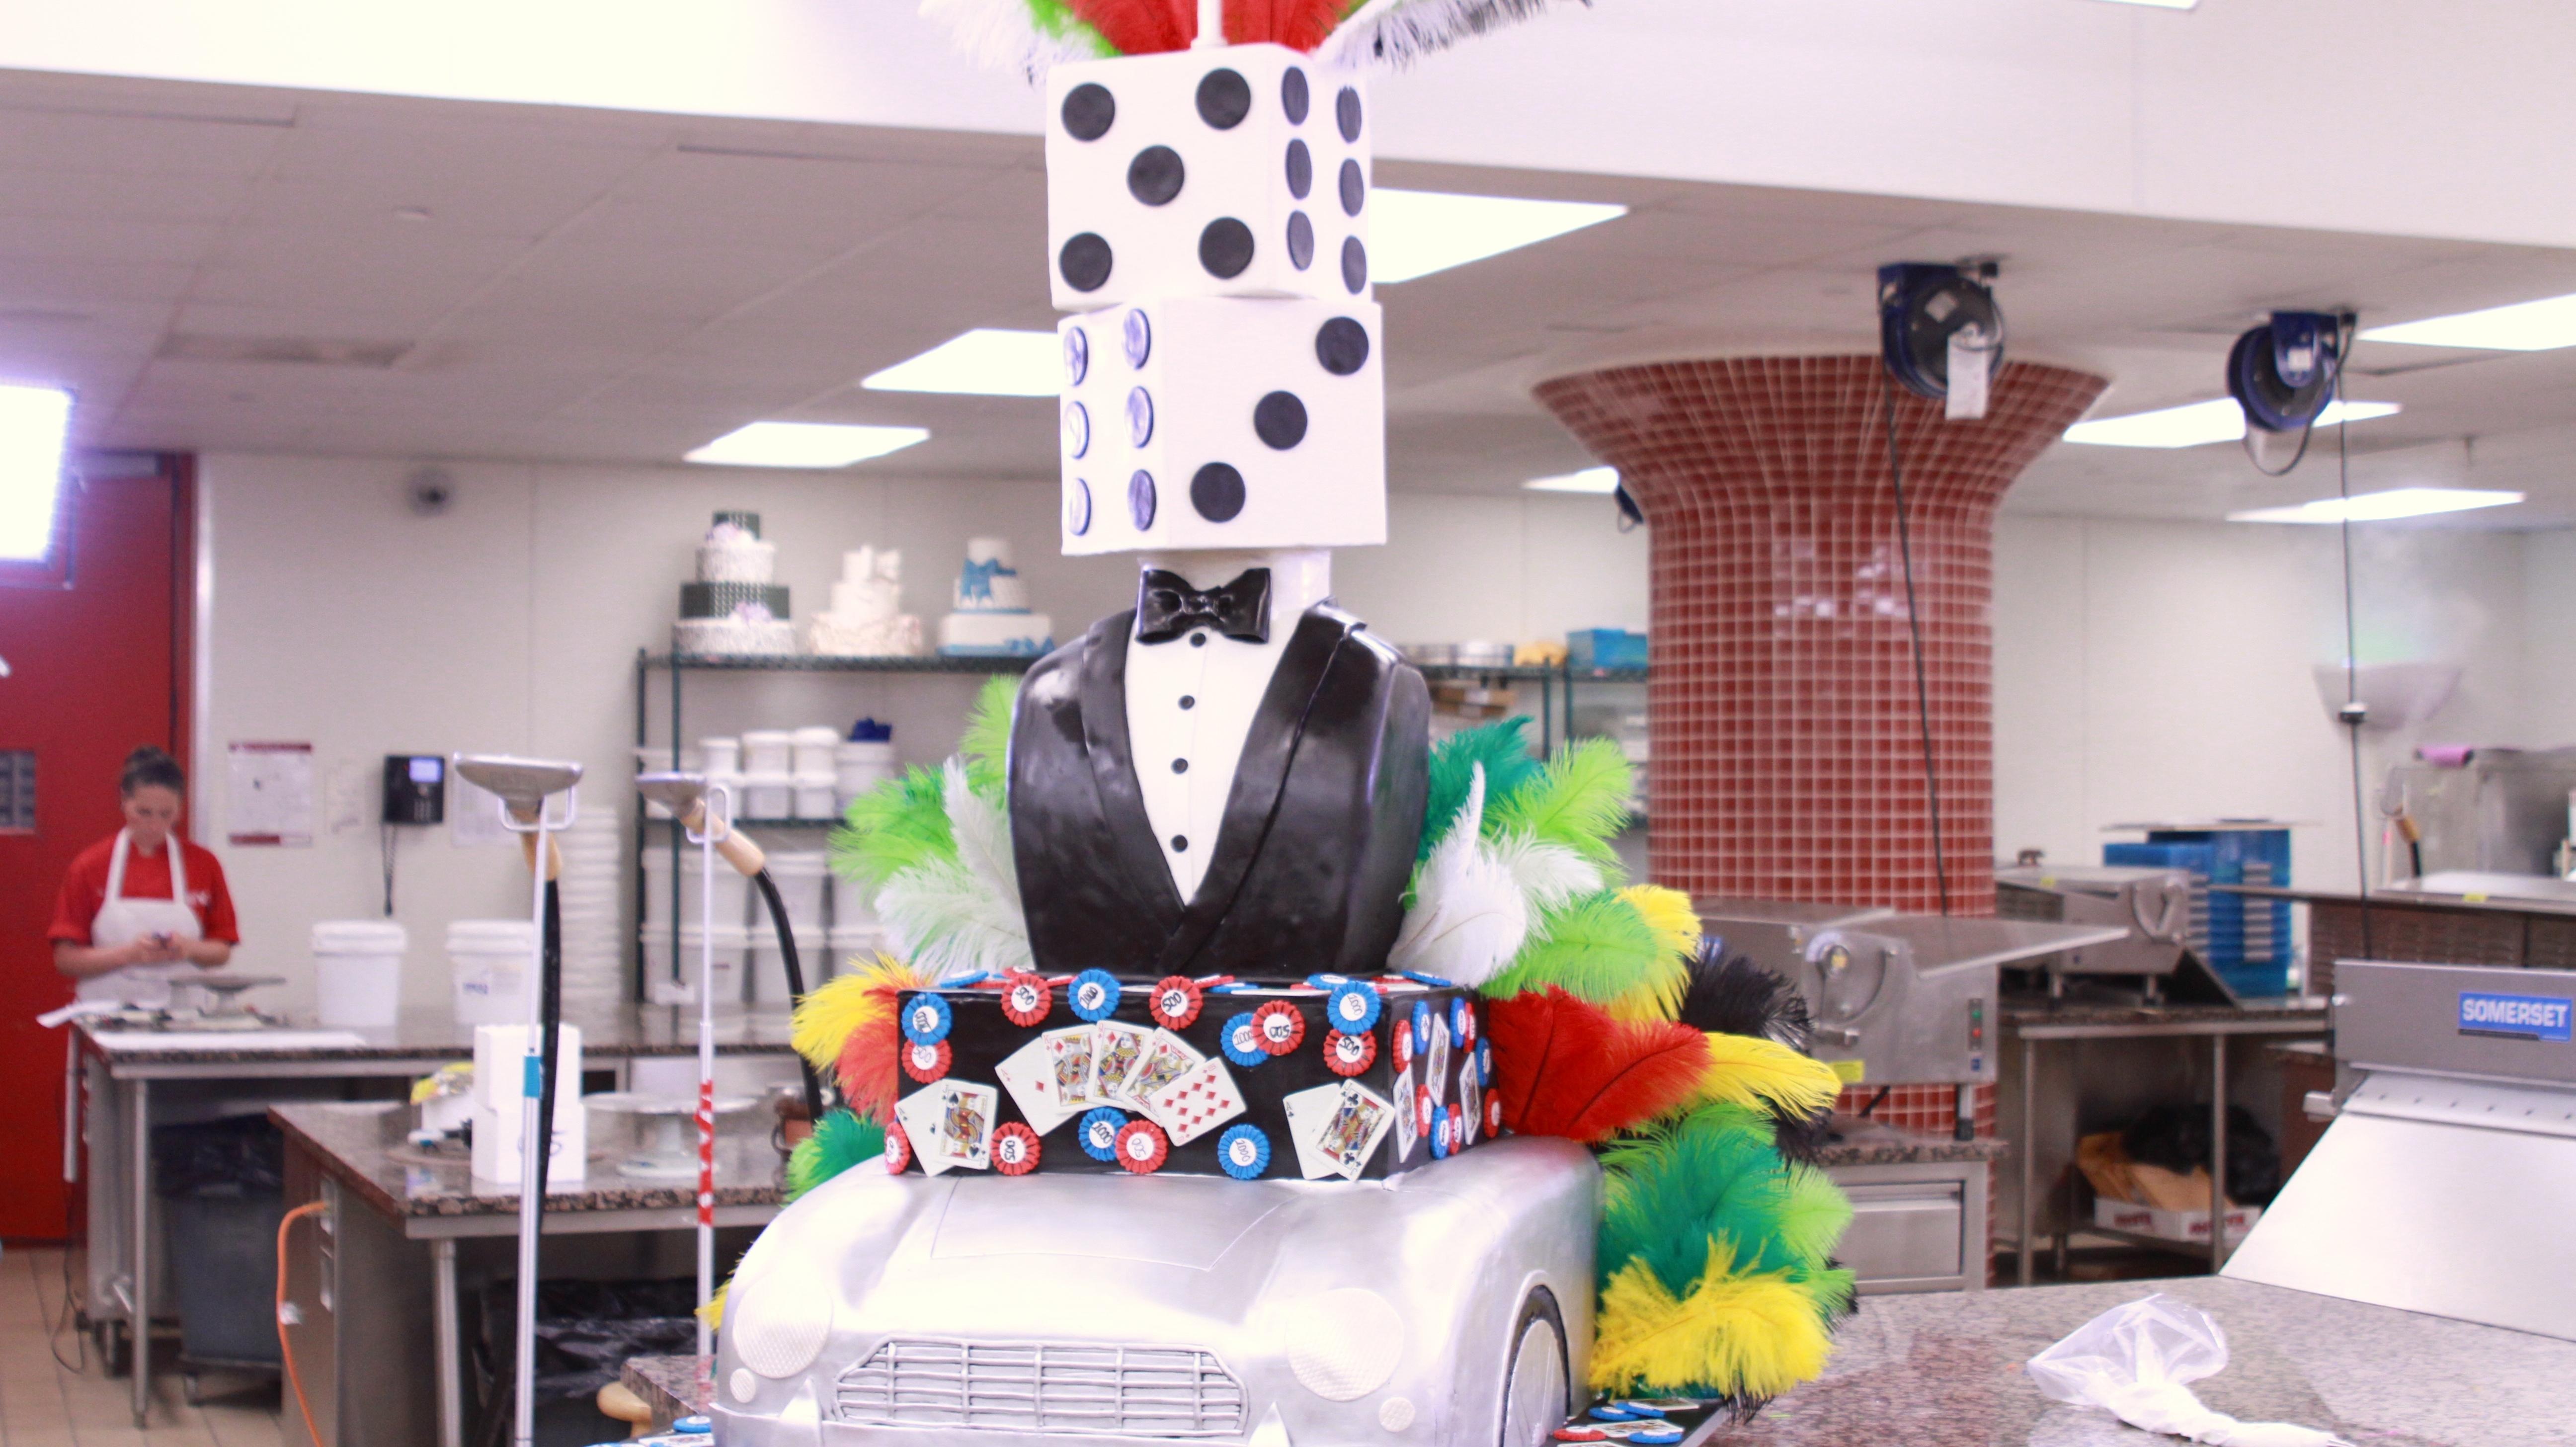 Cake Boss S08 E06 Spies Splashes and Bakery Love